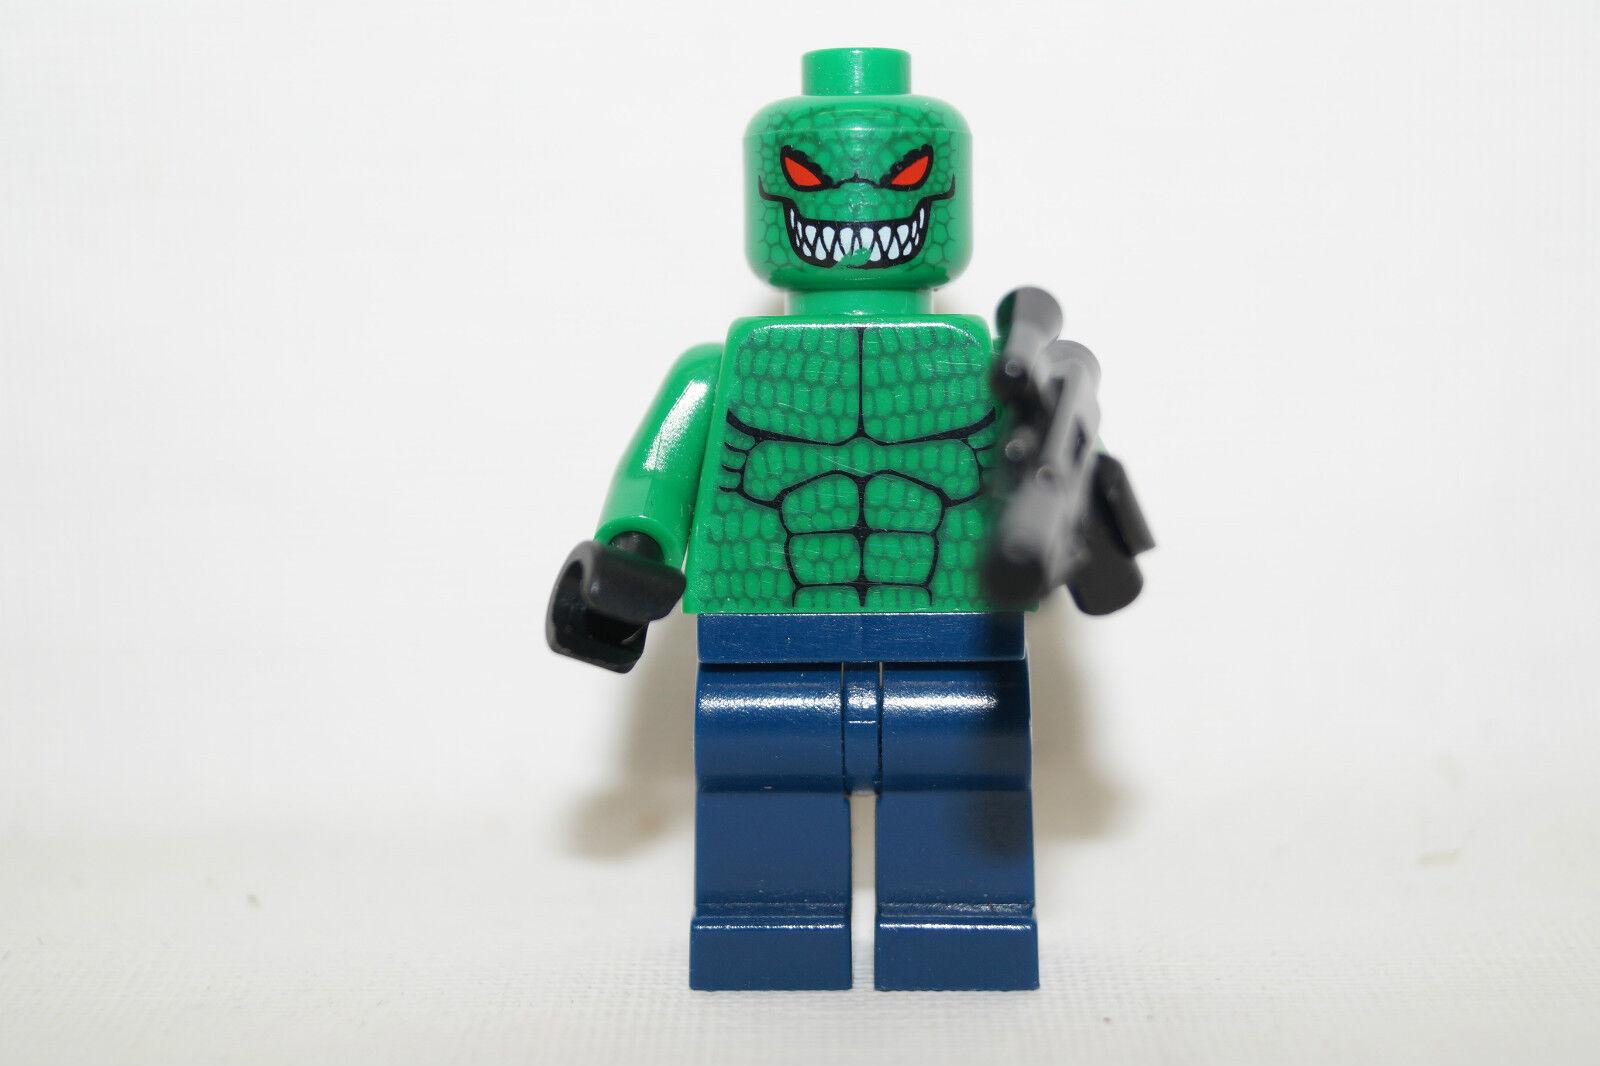 LEGO BATMAN, Killer Croc with gun from Set 7780